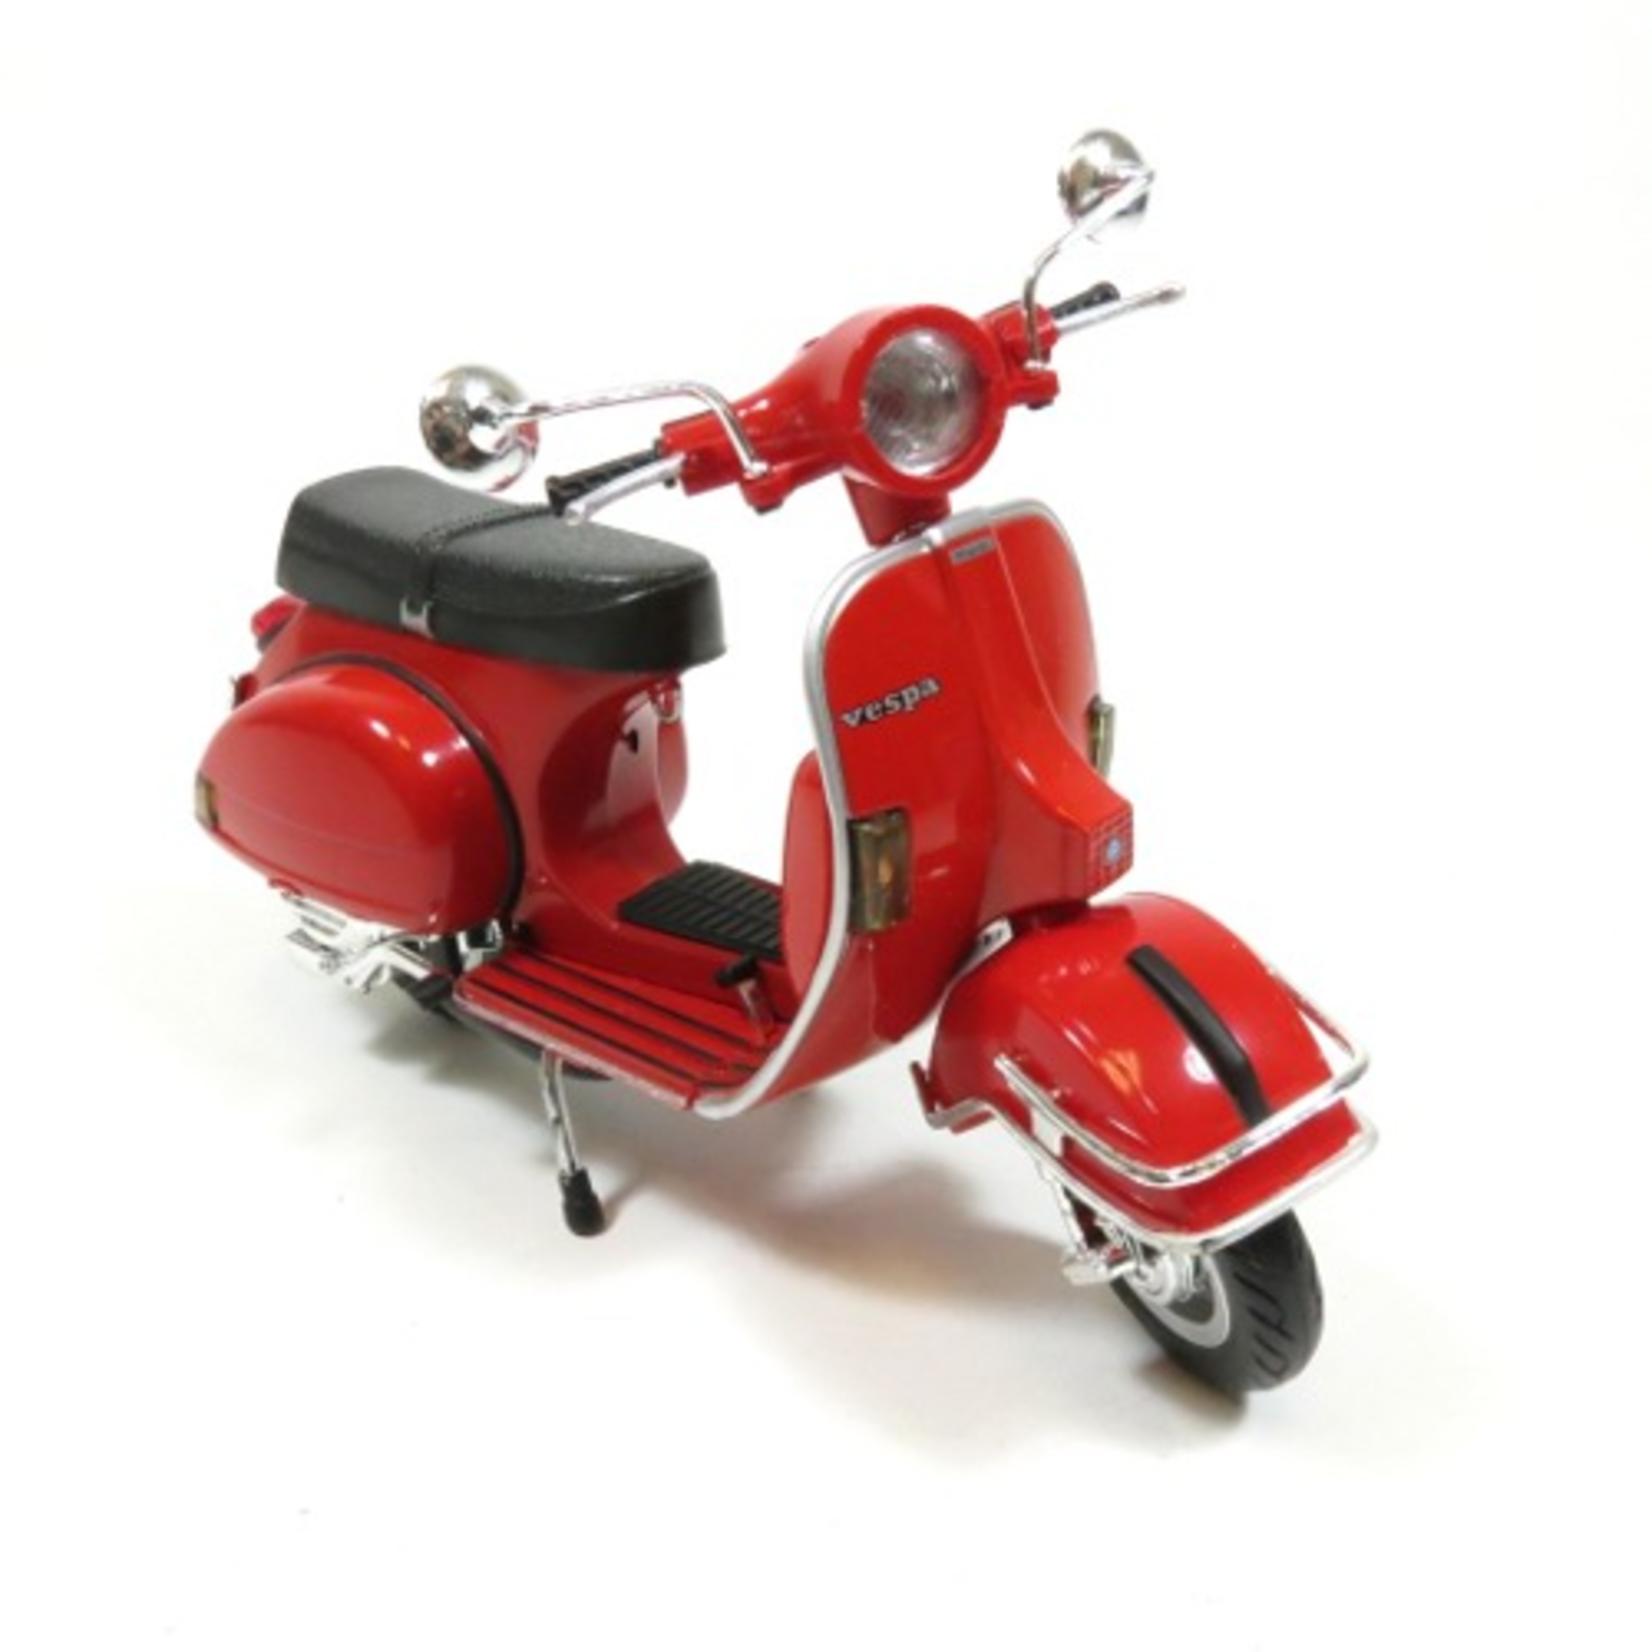 Lifestyle Toy, 1978 Vespa P200E  1:12 Red